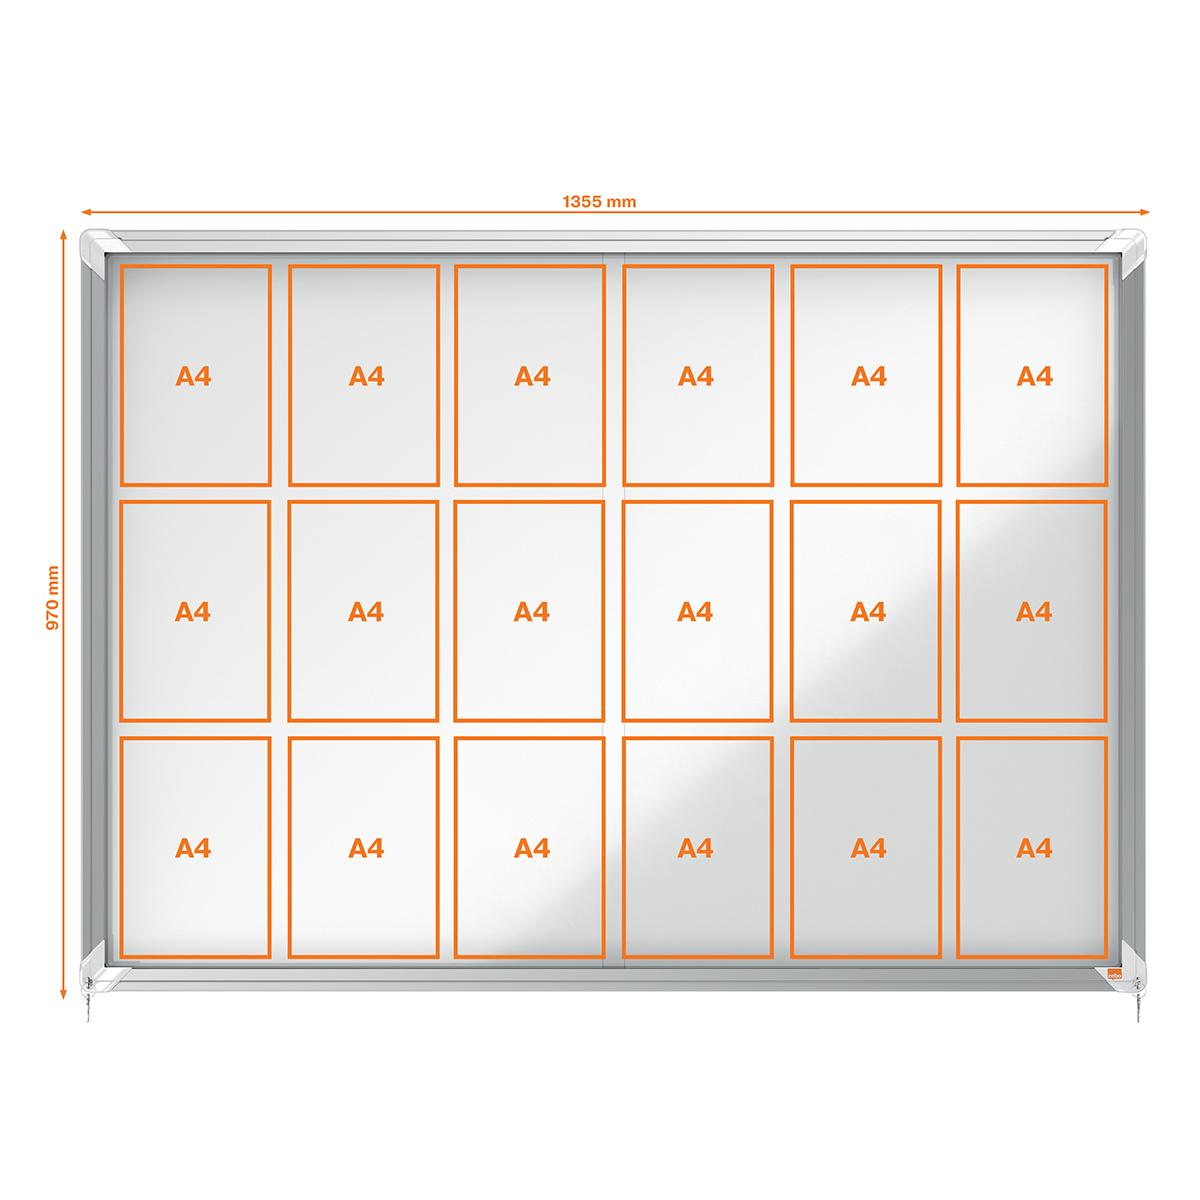 Nobo 1902571 Internal Glazed Case 18 x A4 Magnetic Sliding Door